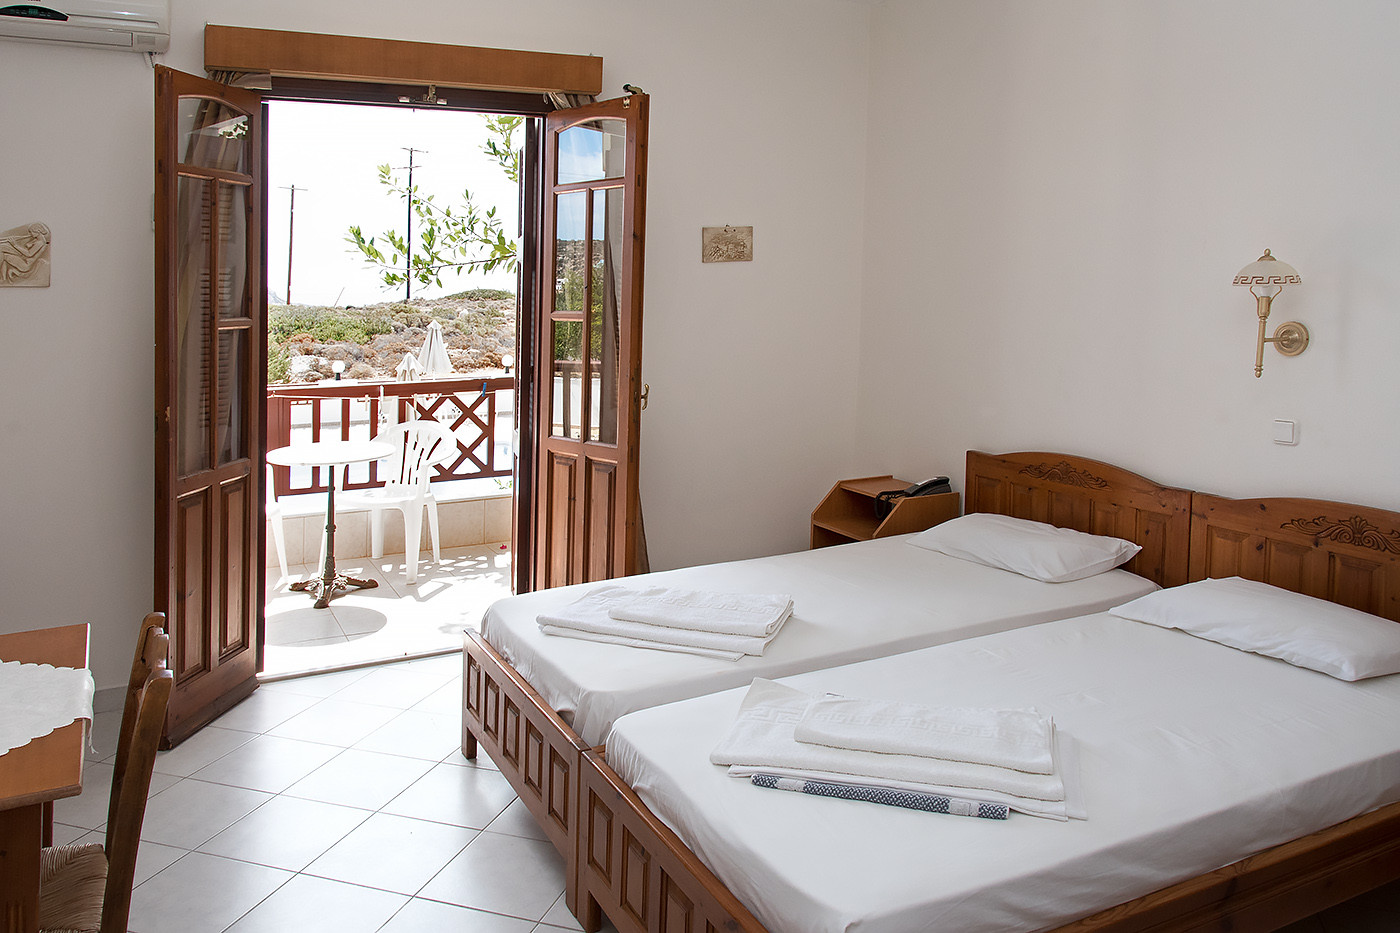 Hotel_Anemoesa_2018_001 (1).jpg